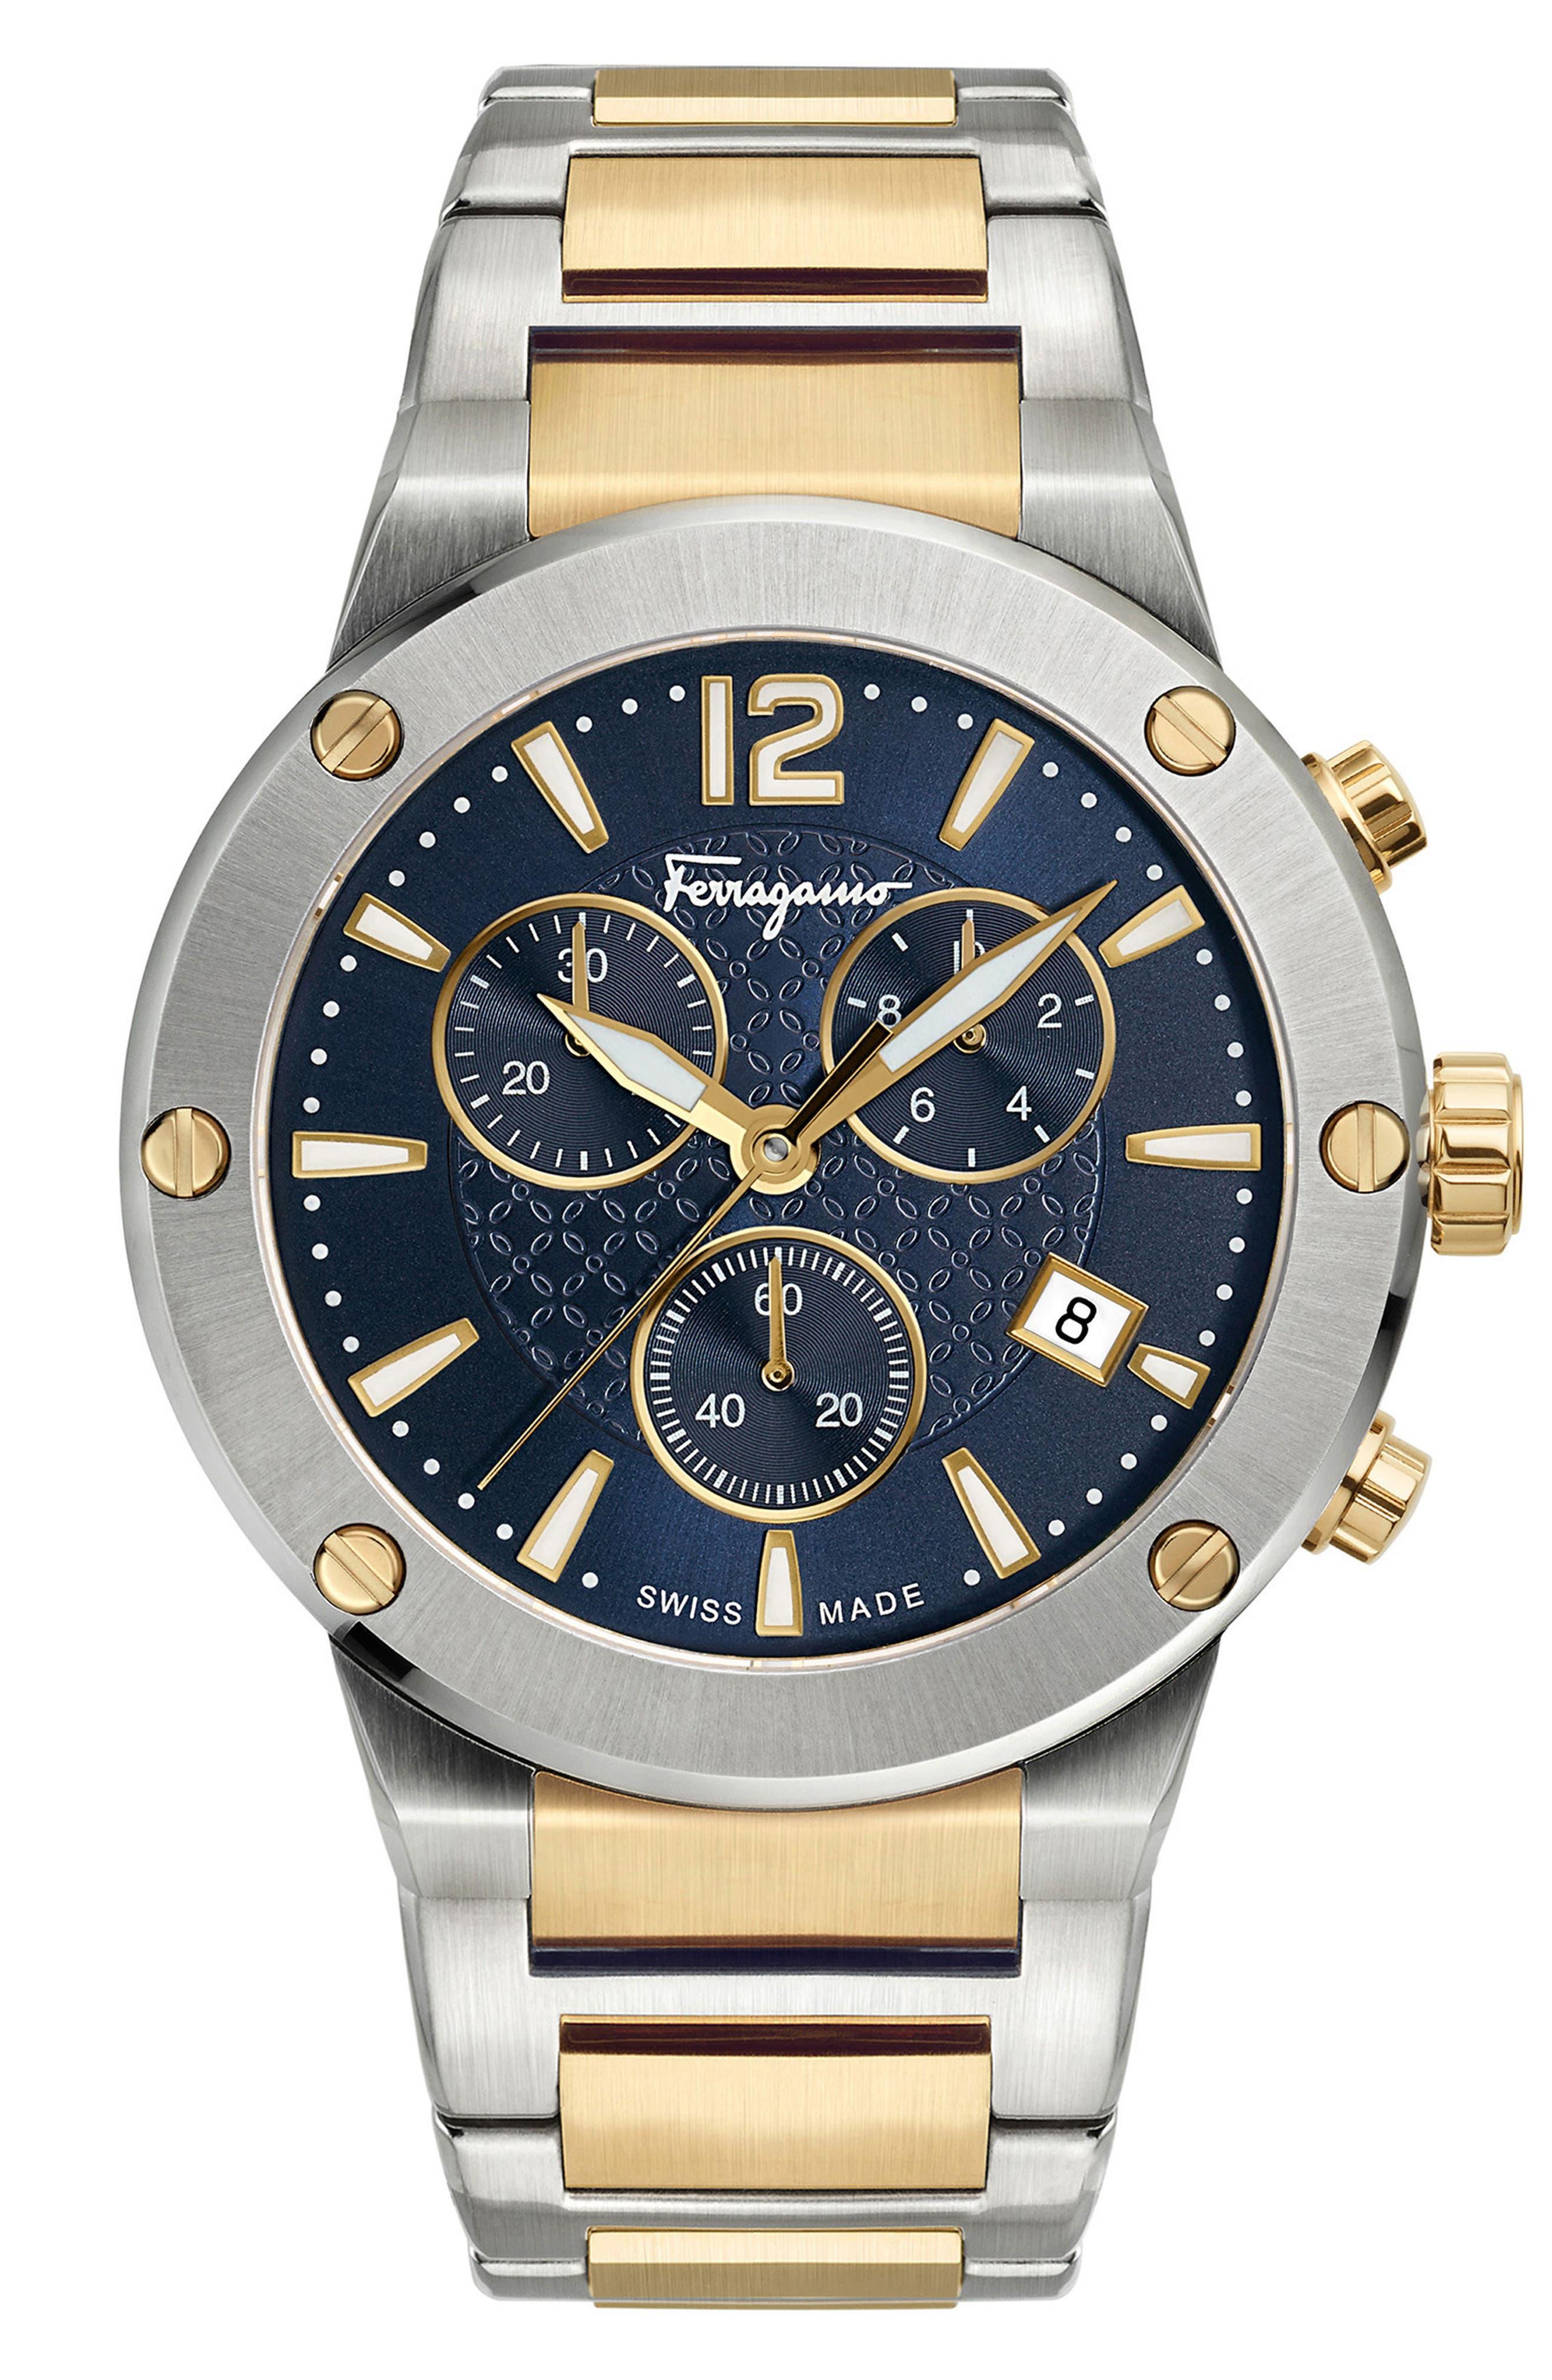 Salvatore Ferragamo F-80 Chronograph Bracelet Watch, 44mm